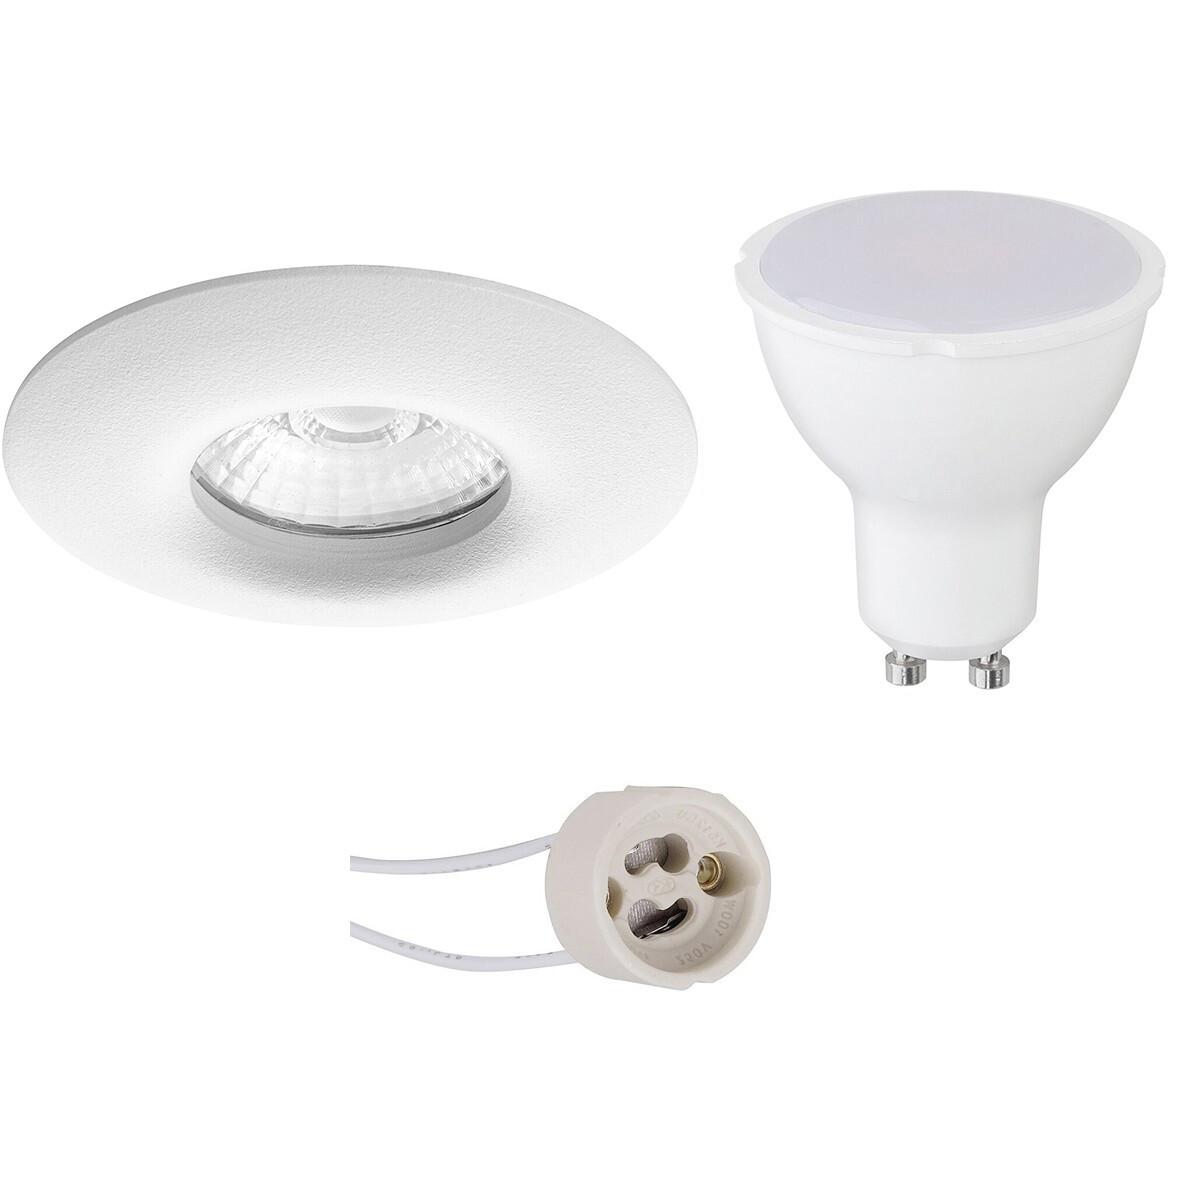 LED Spot Set - Pragmi Luno Pro - Waterdicht IP65 - GU10 Fitting - Inbouw Rond - Mat Wit - 8W - Natuu